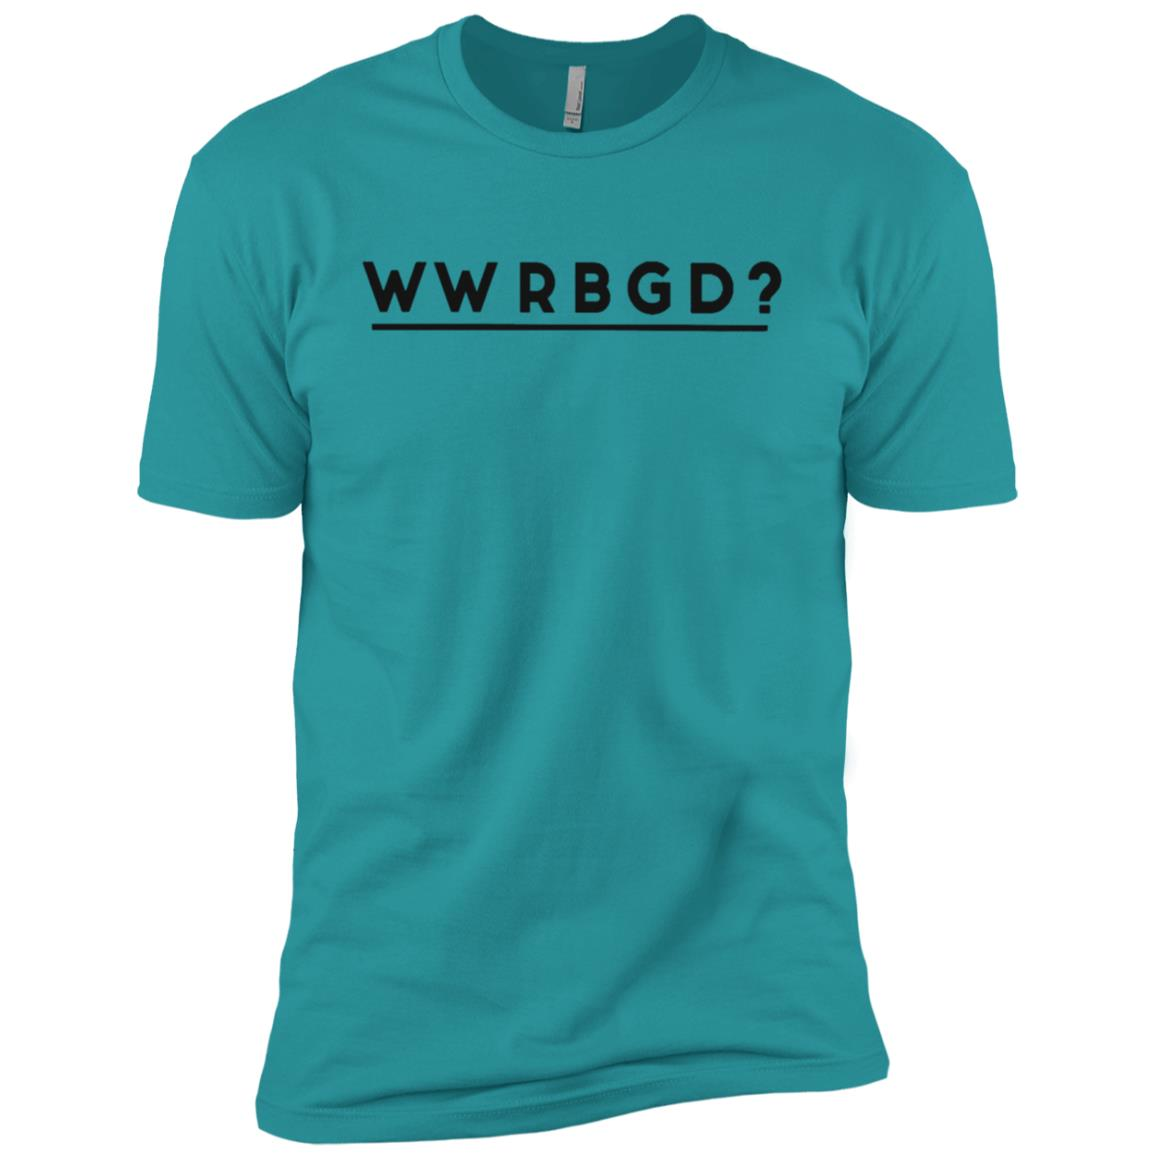 Wwrbgd Ruth Bader Ginsburg Rbg Feminist Men Short Sleeve T-Shirt